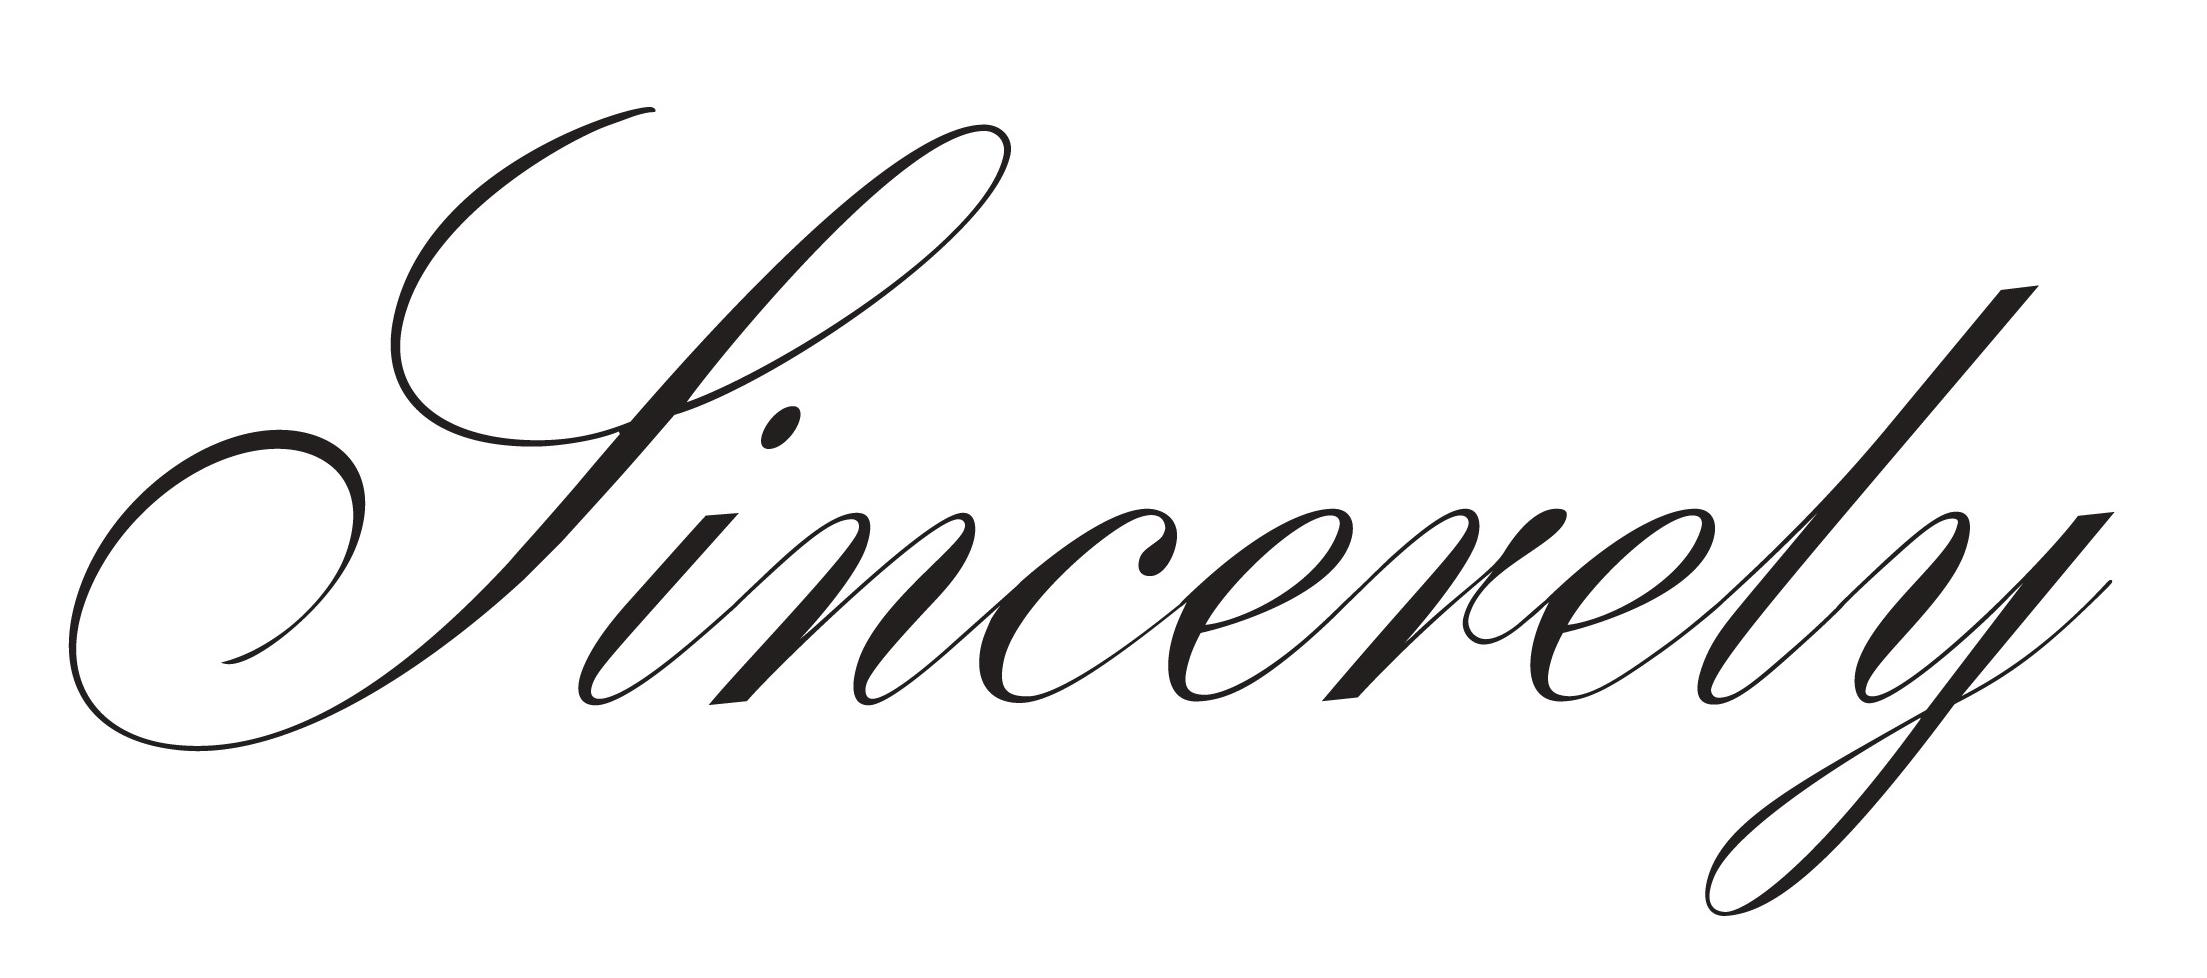 sincearley